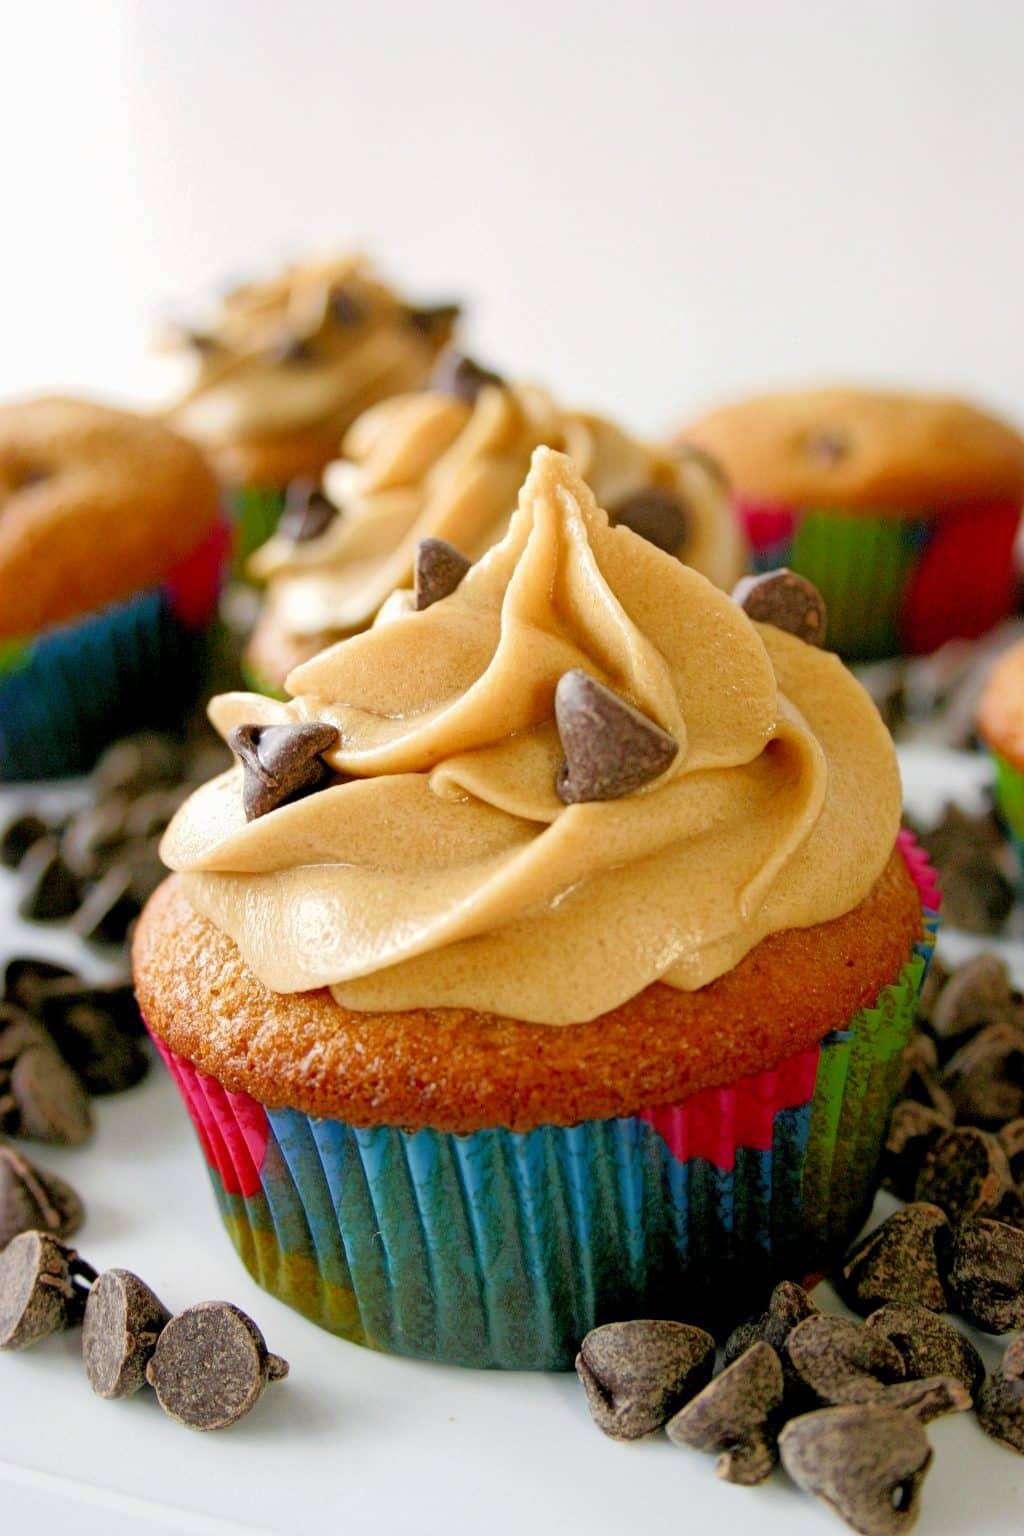 Chocolate Chip Cookie Dough Cupcakes | Kitchen Gidget